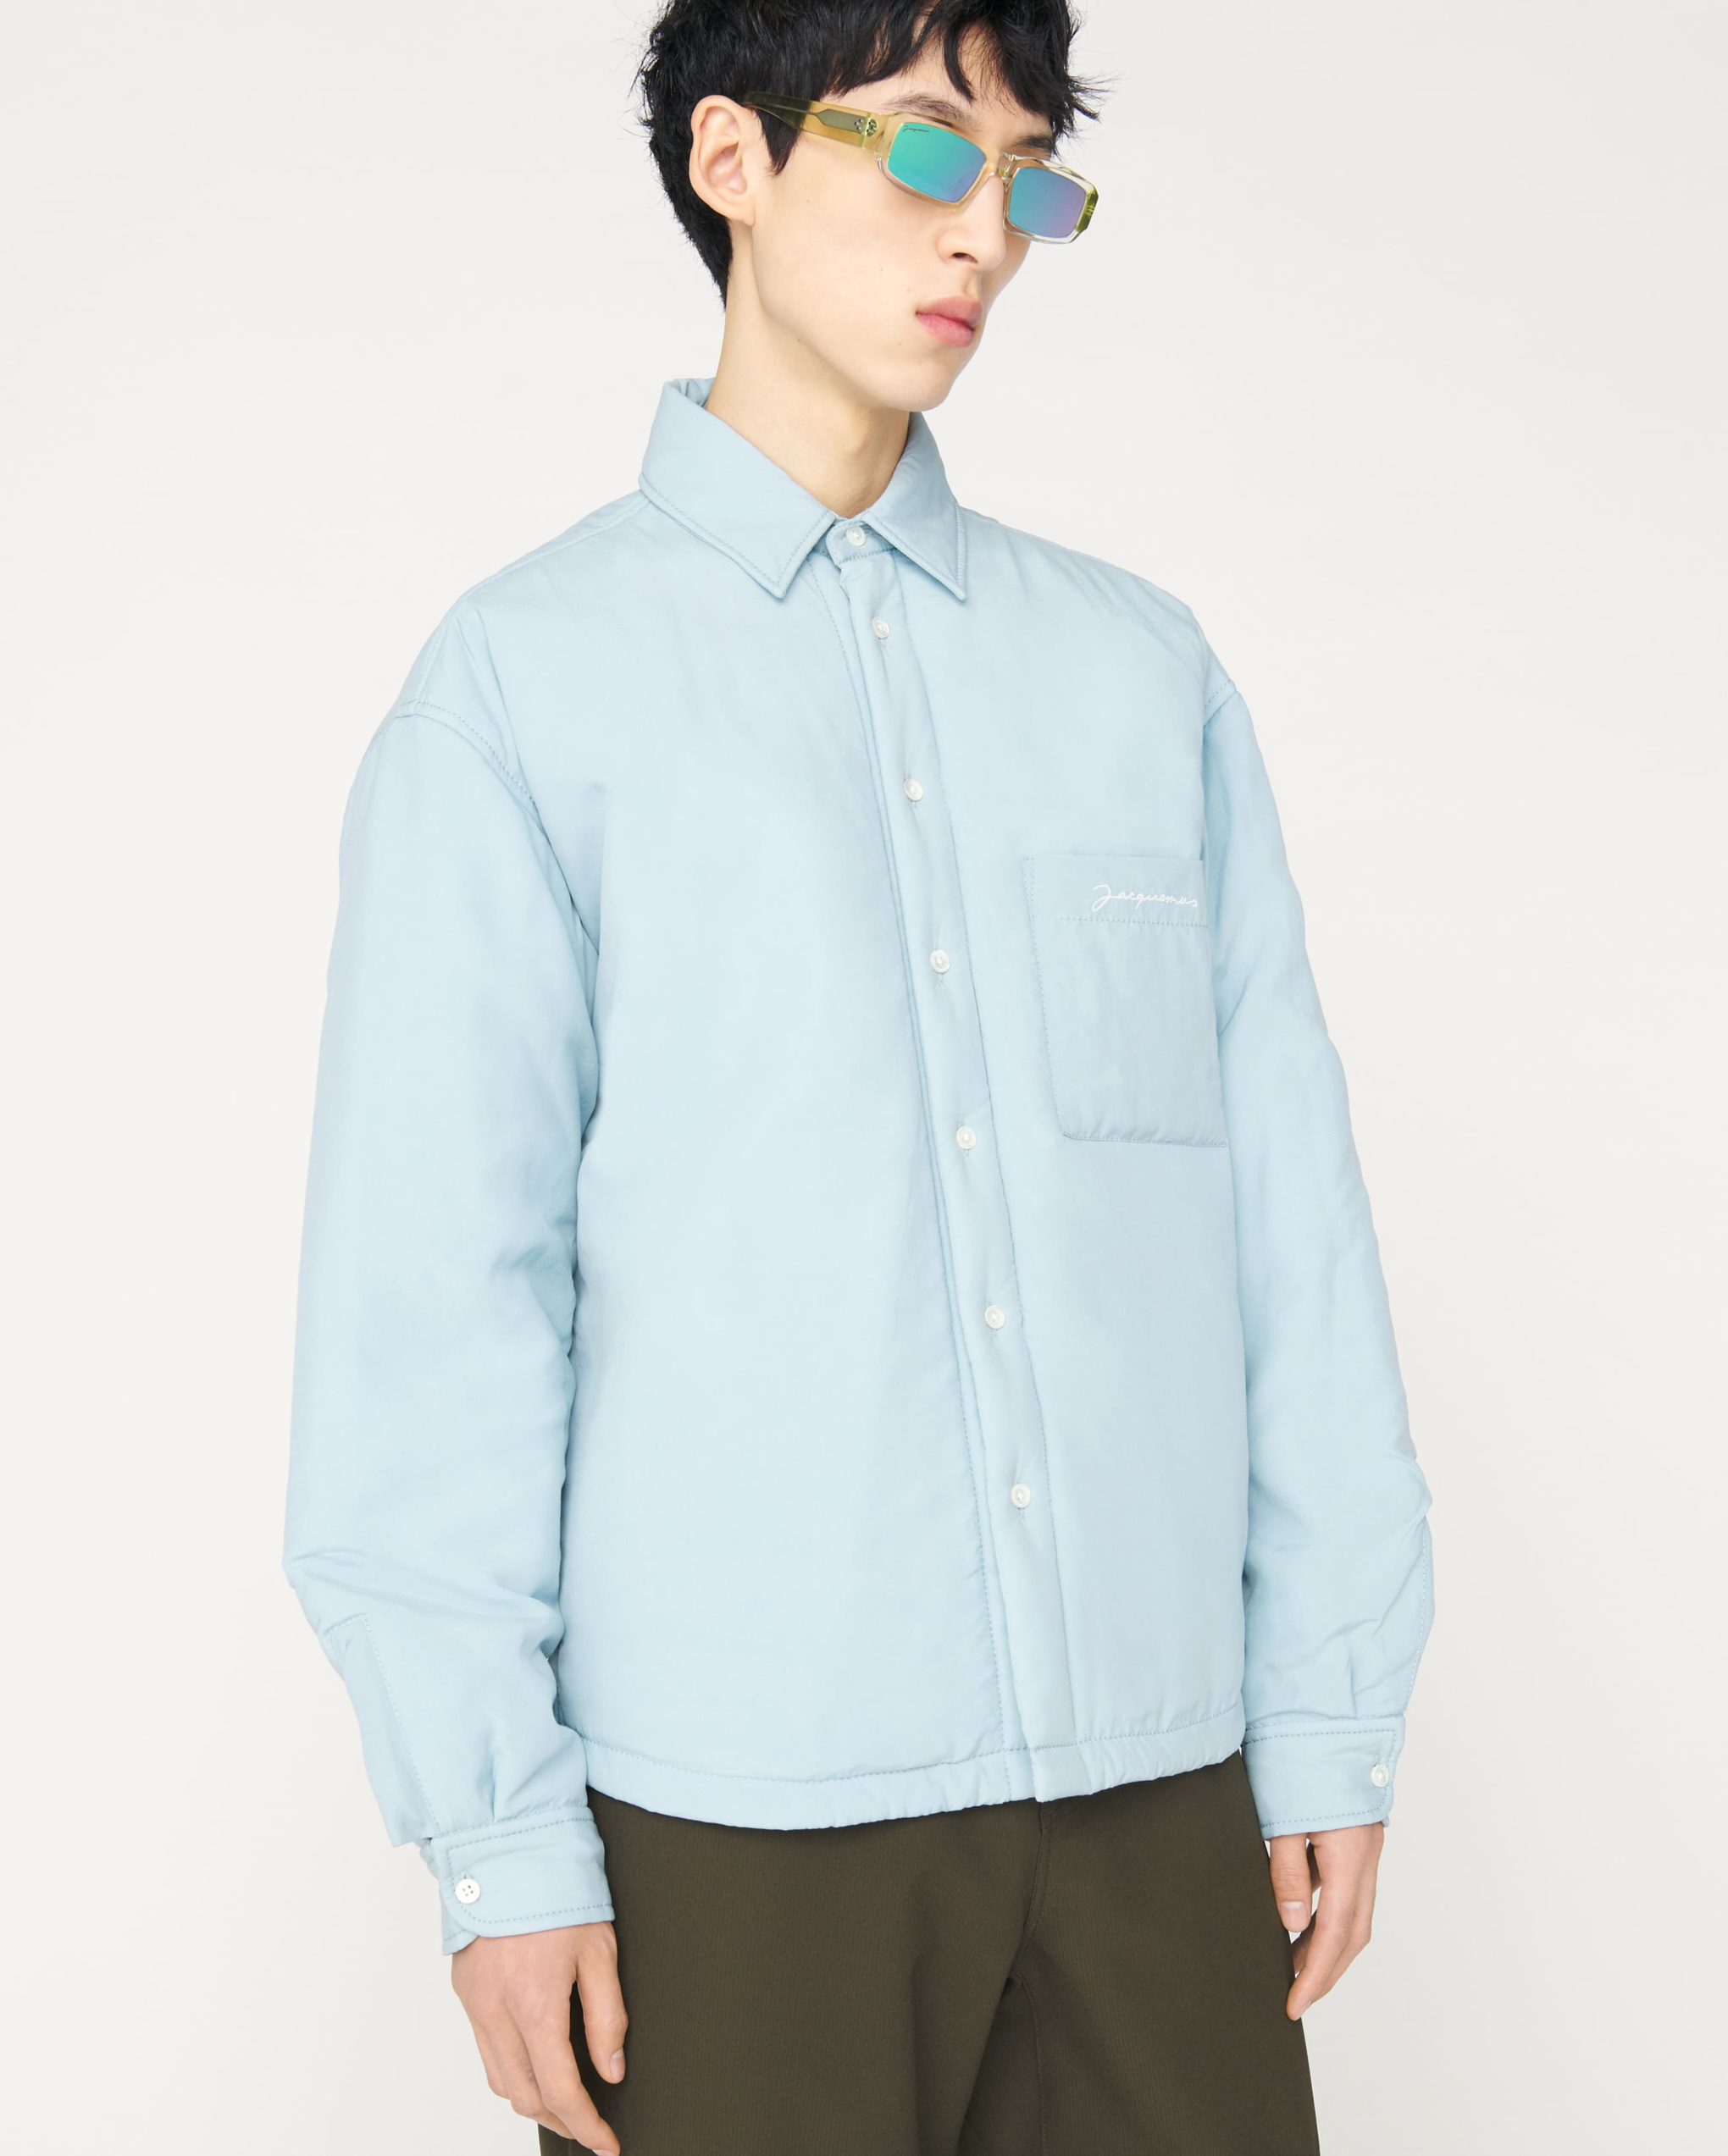 La chemise Boulanger